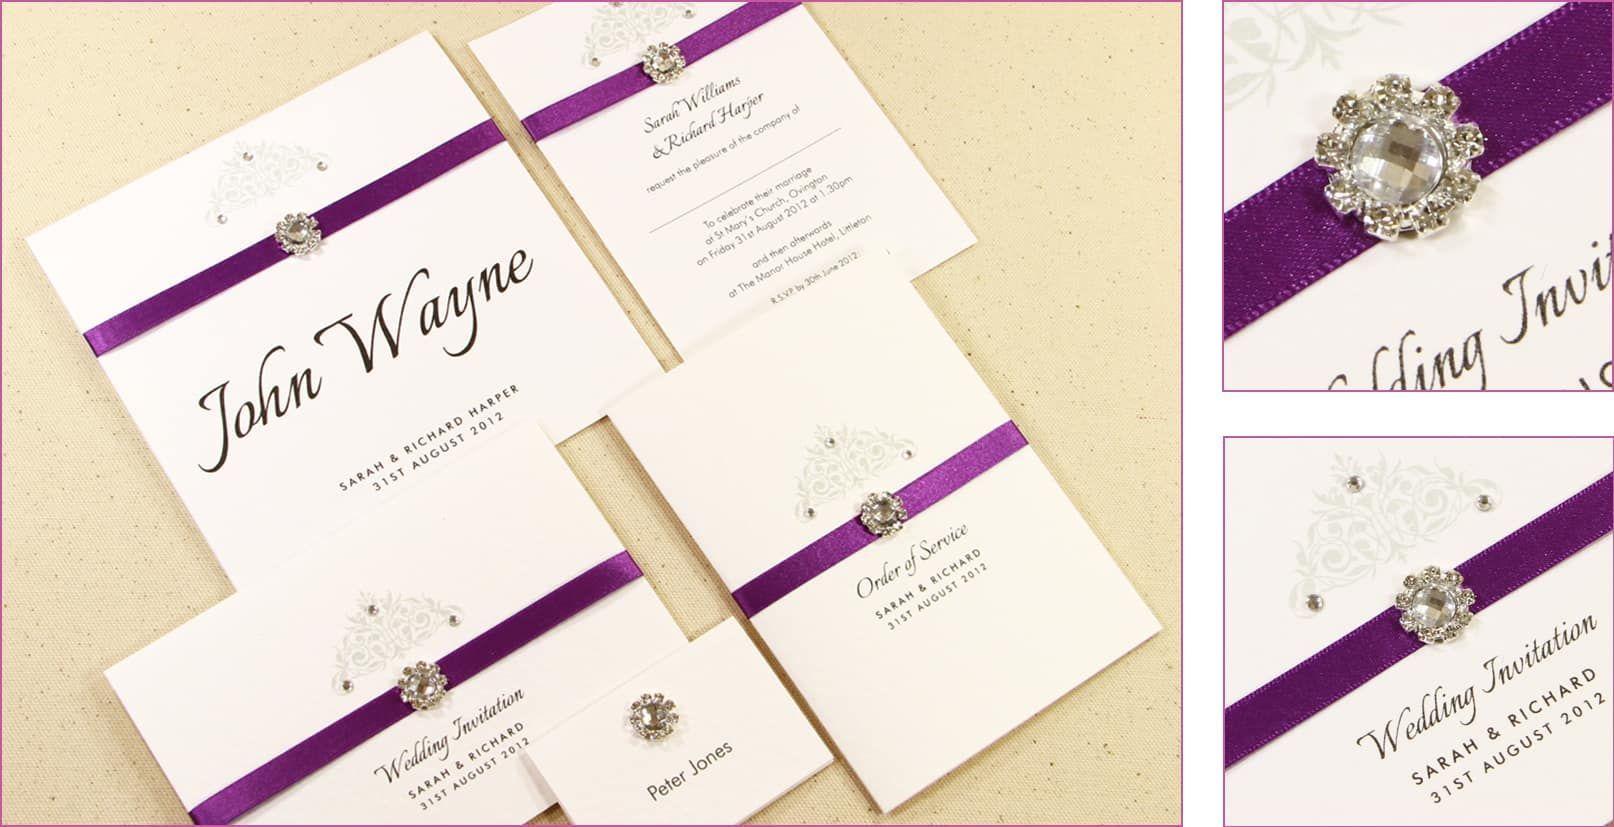 Cool how to create homemade wedding invitations free ideas cool how to create homemade wedding invitations free ideas howtowordweddinginvitations solutioingenieria Gallery